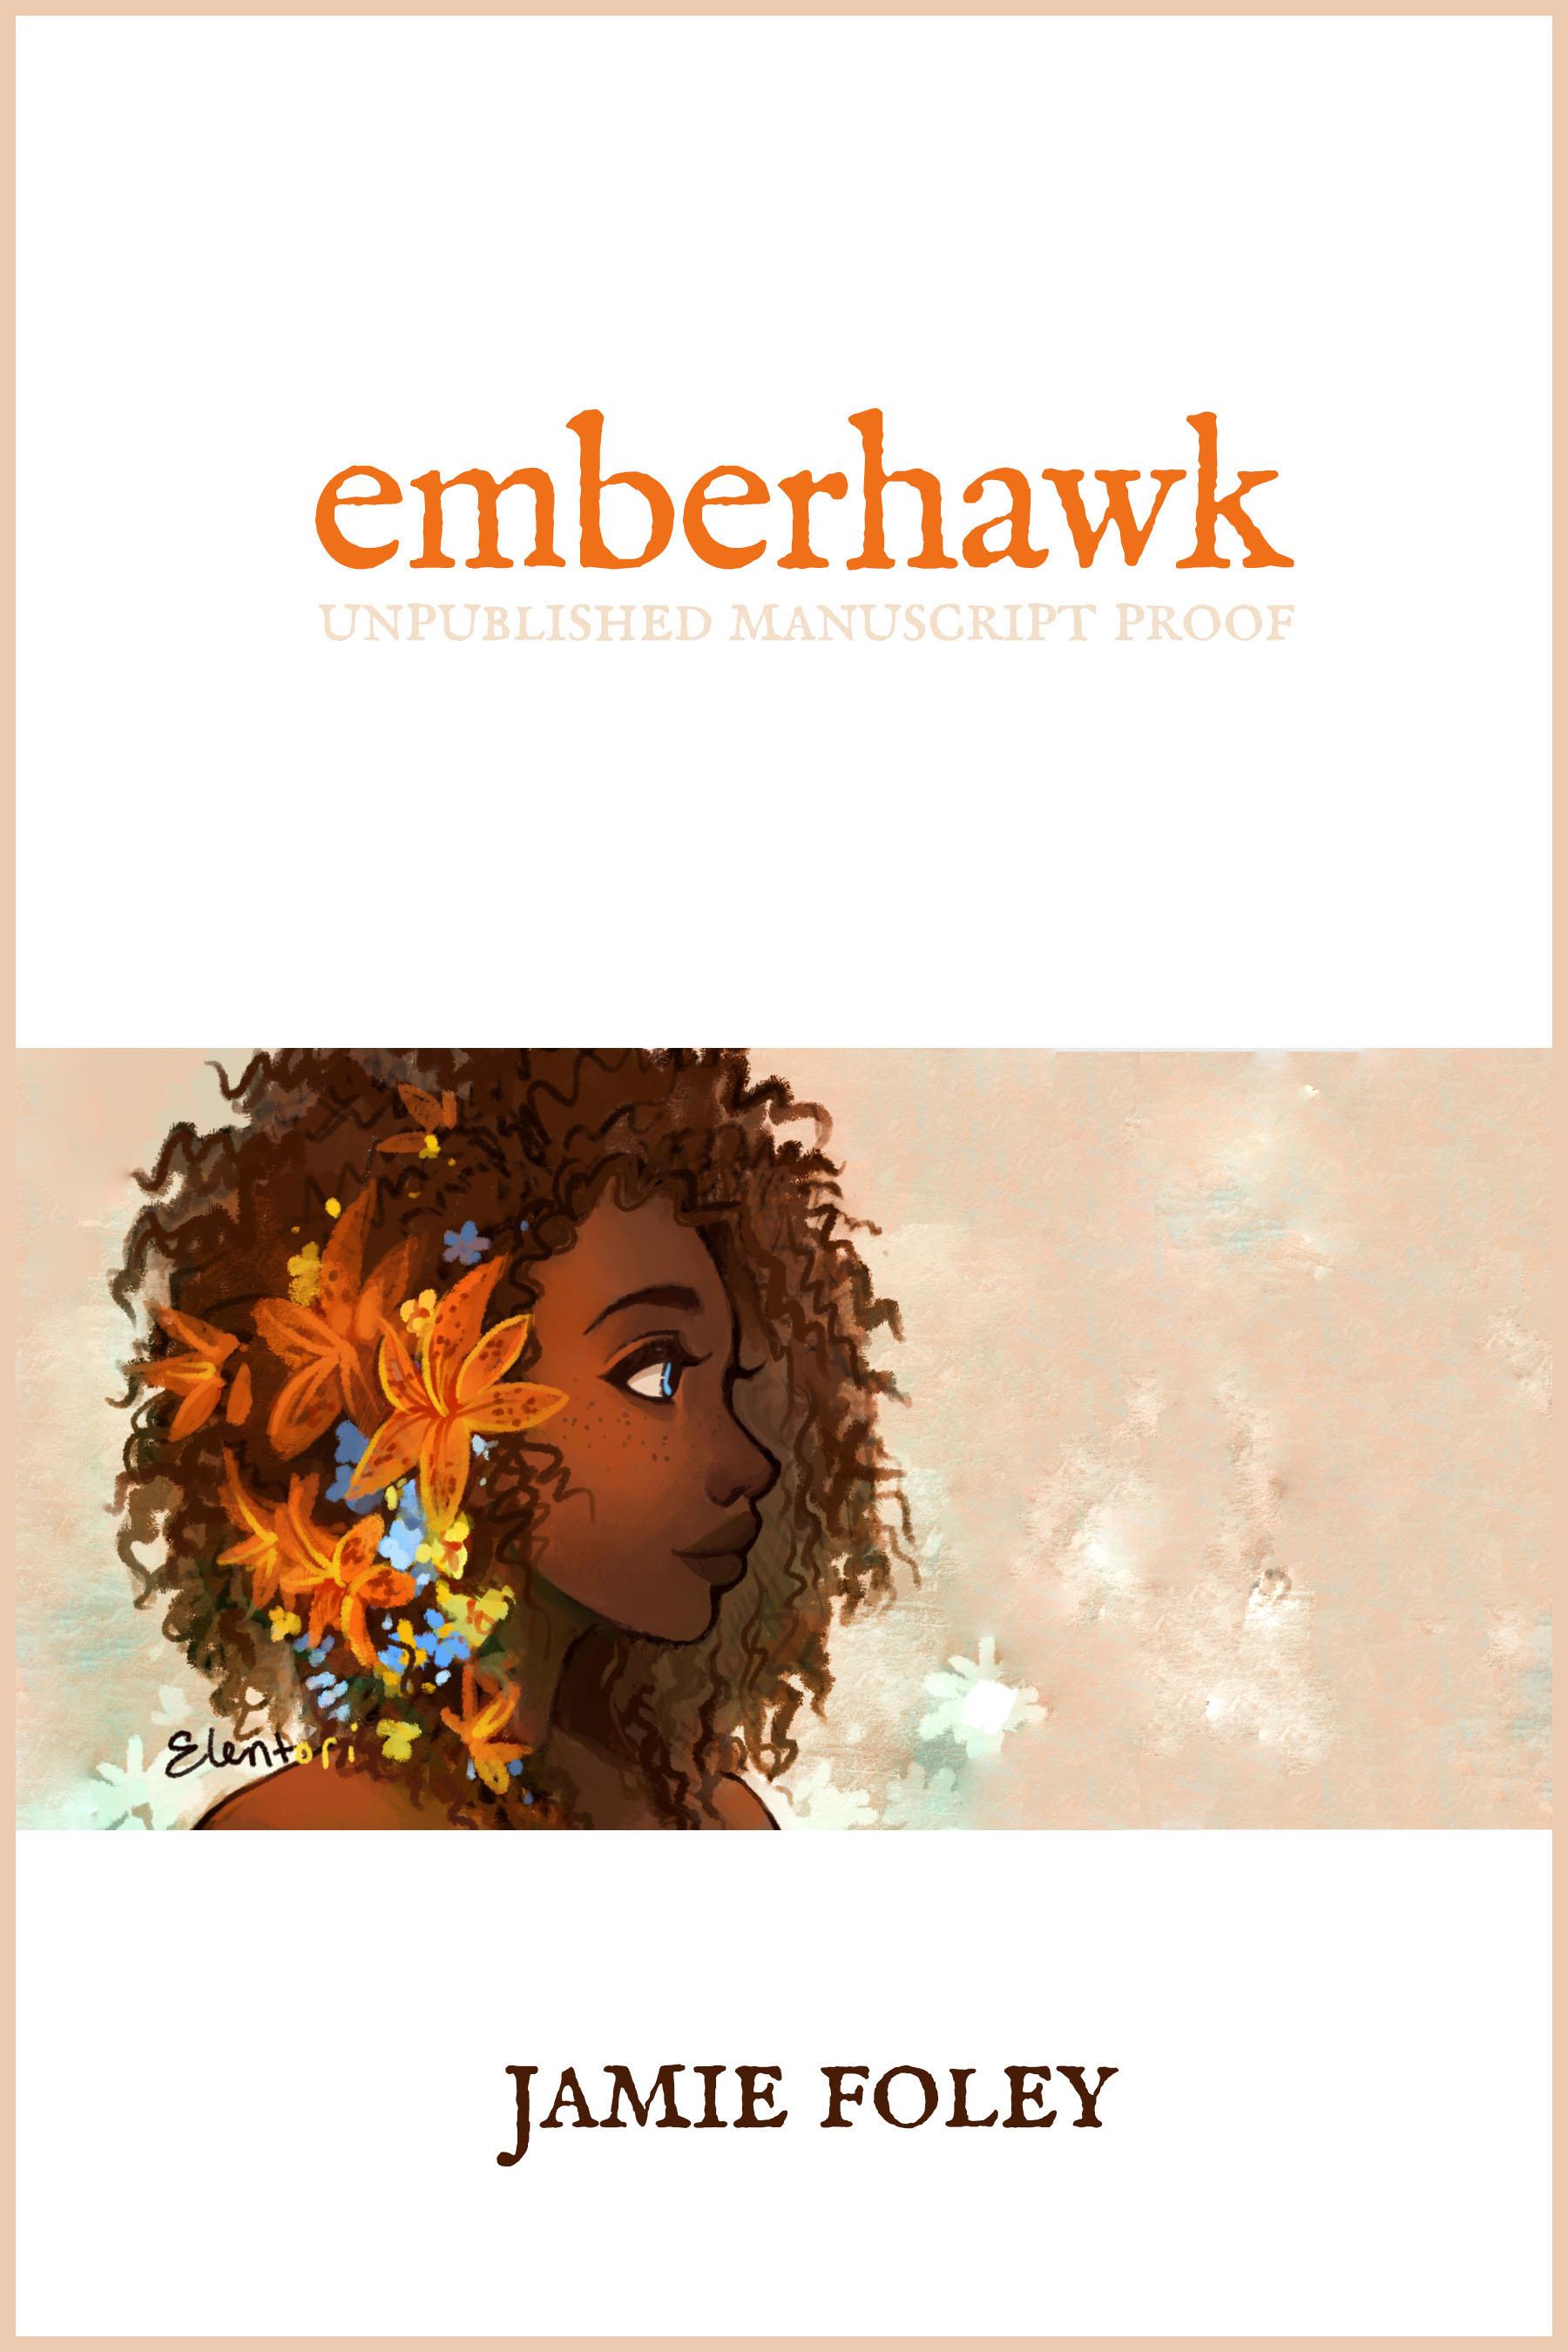 Emberhawk